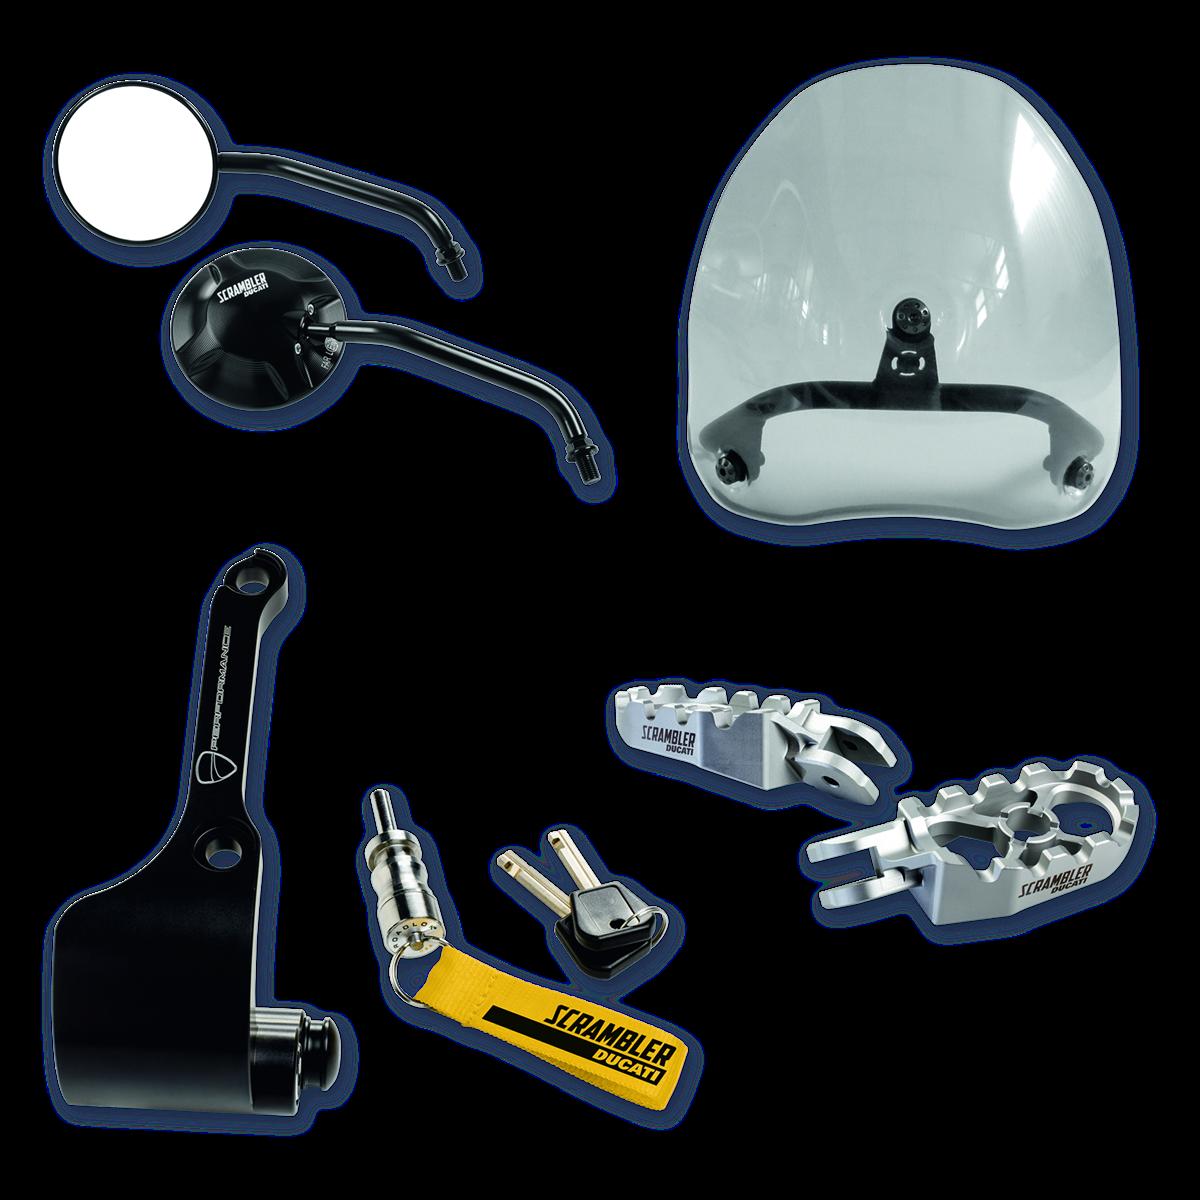 kit accessoires city 97980521a. Black Bedroom Furniture Sets. Home Design Ideas